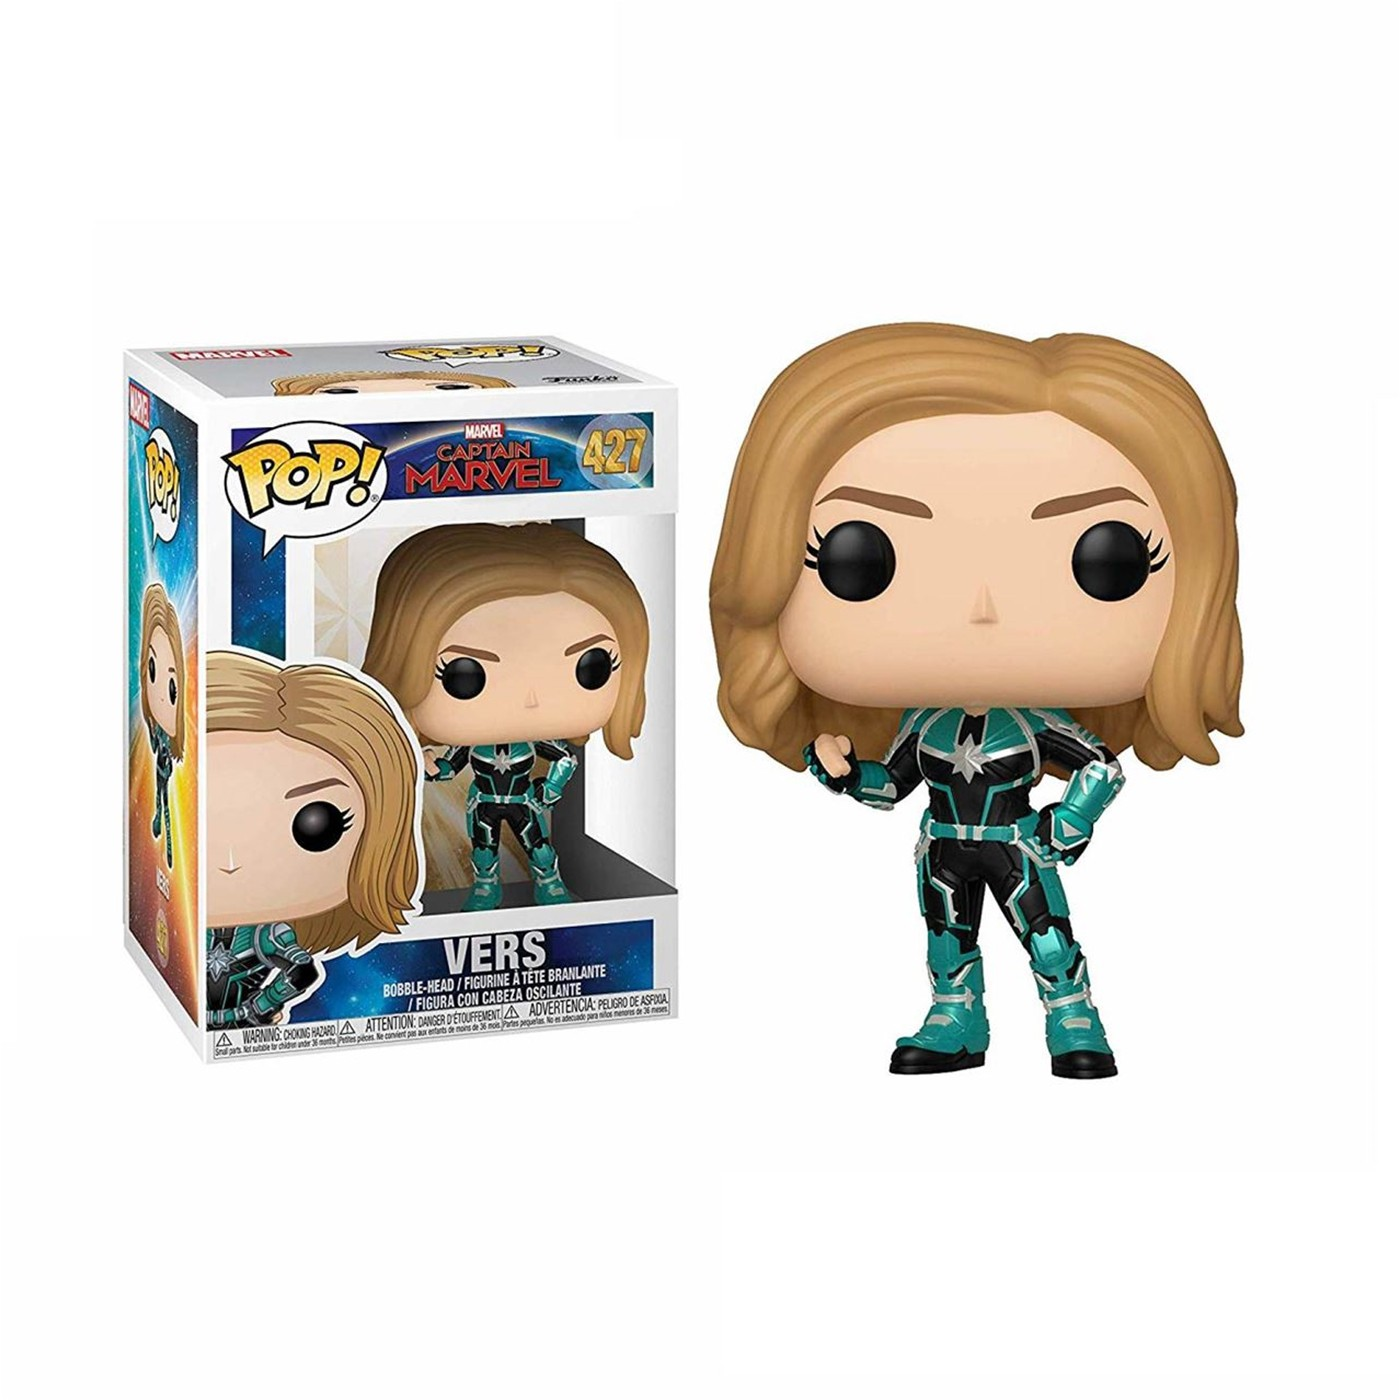 Pop! Marvel: Captain Marvel - Vers